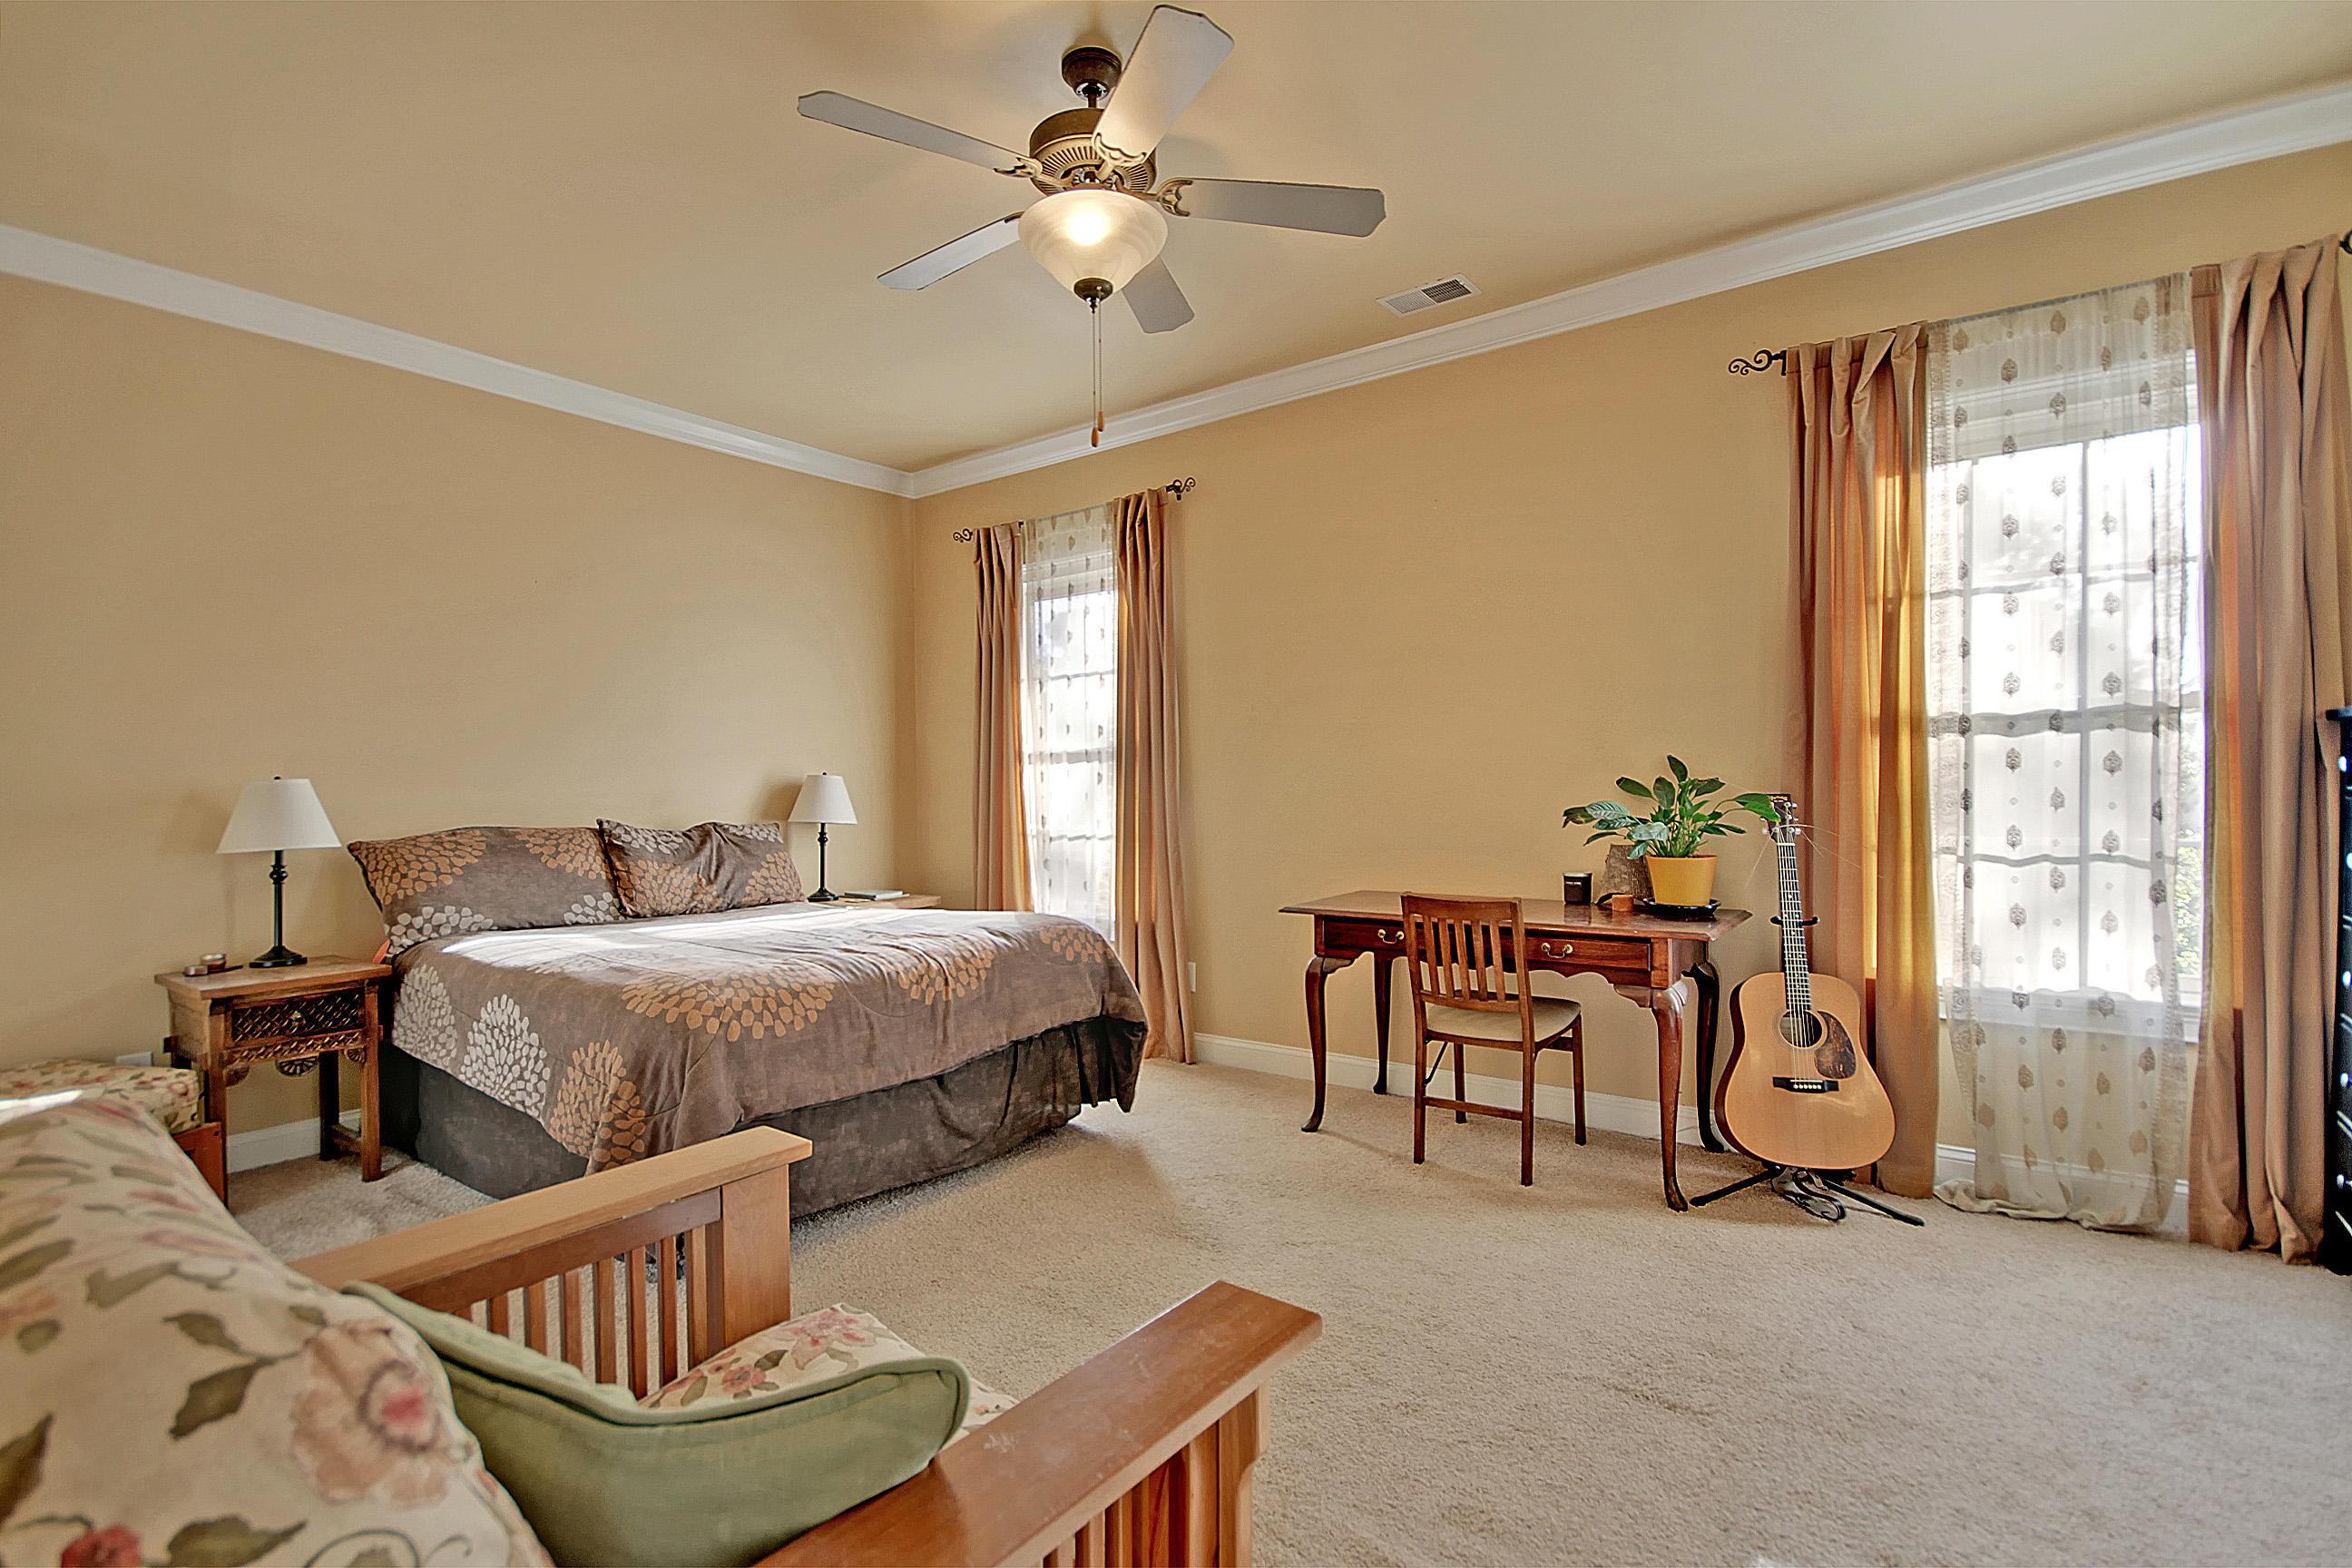 Cloudbreak Court Homes For Sale - 638 Cloudbreak, Charleston, SC - 9